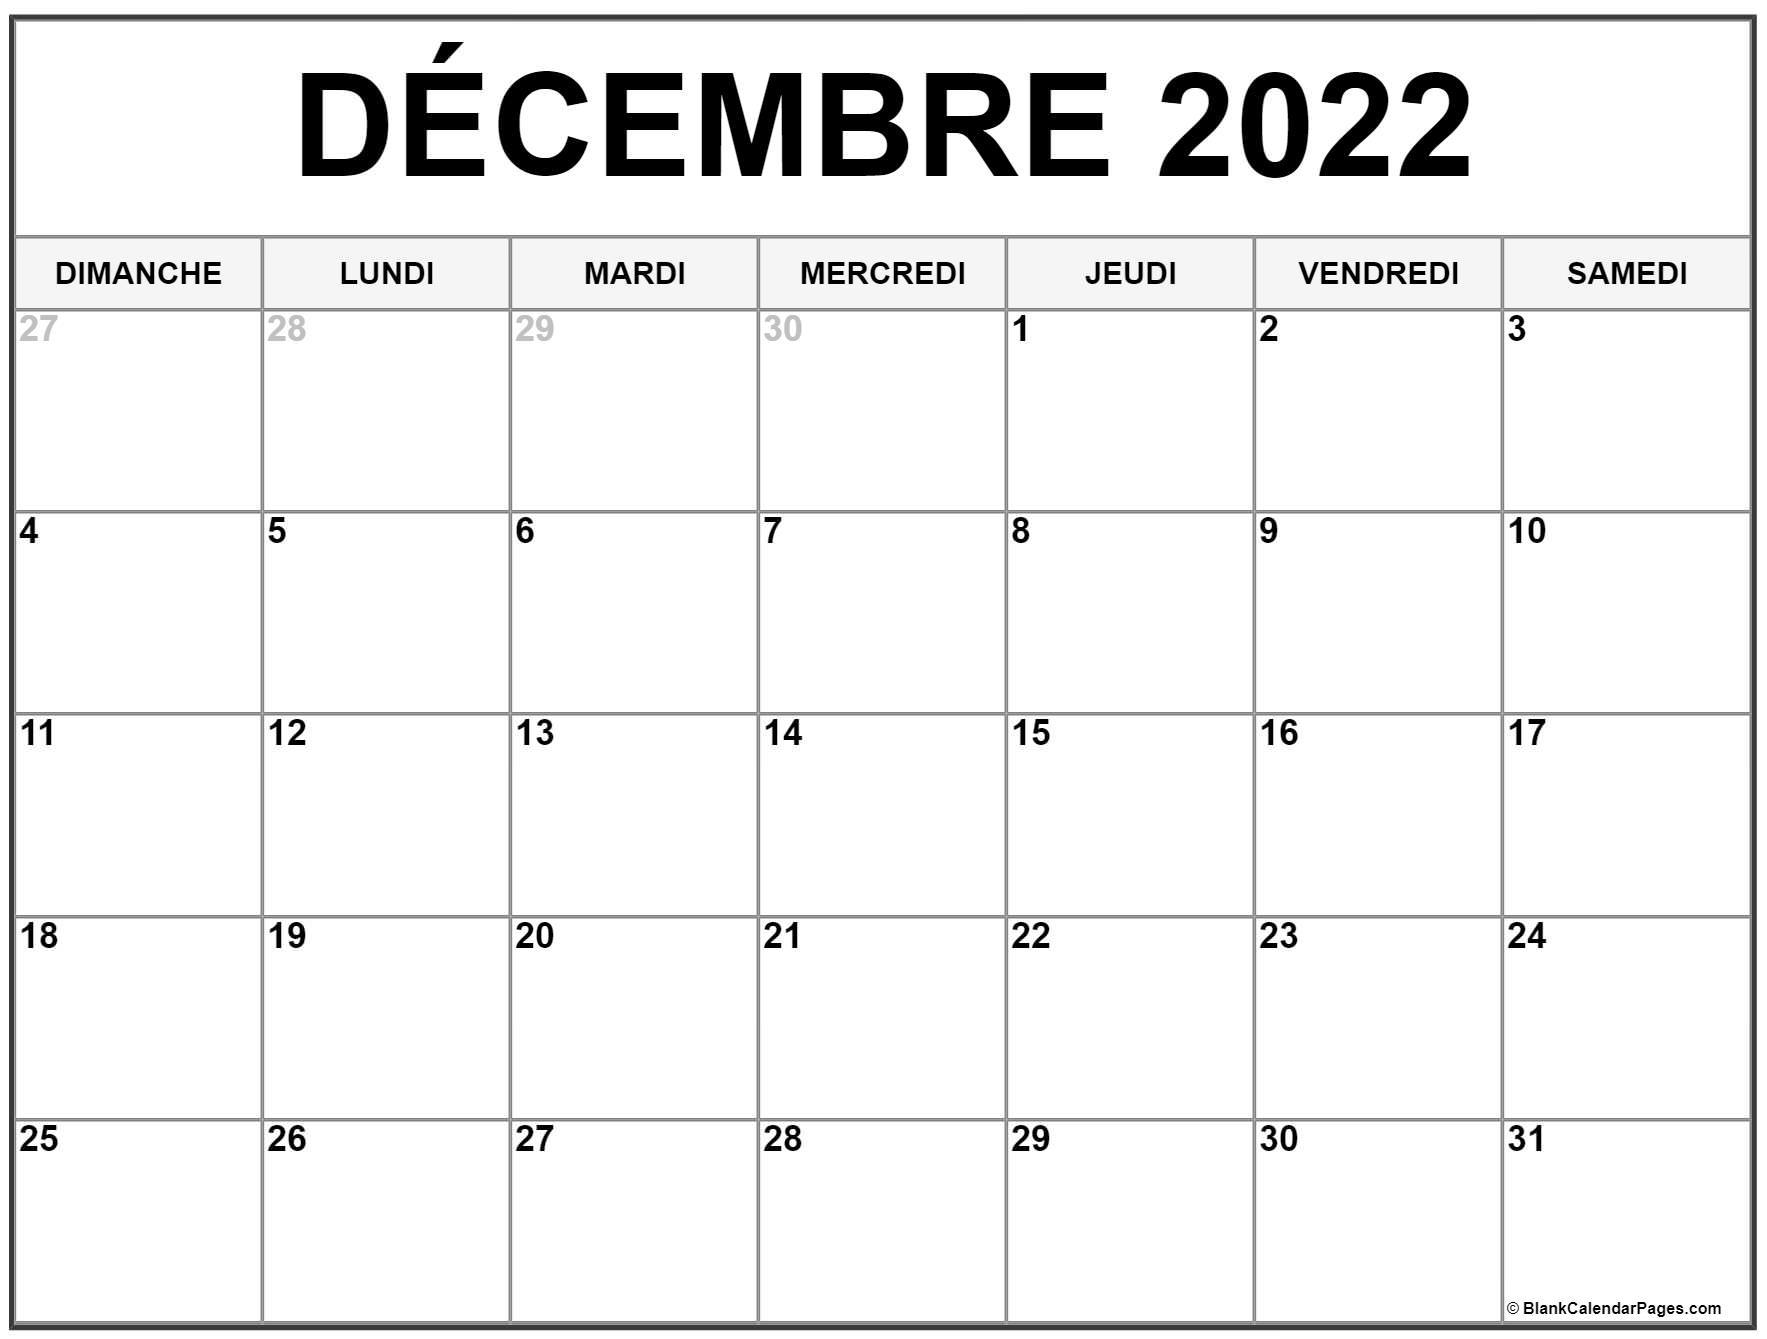 Decembre Vacances 2022 Calendrier